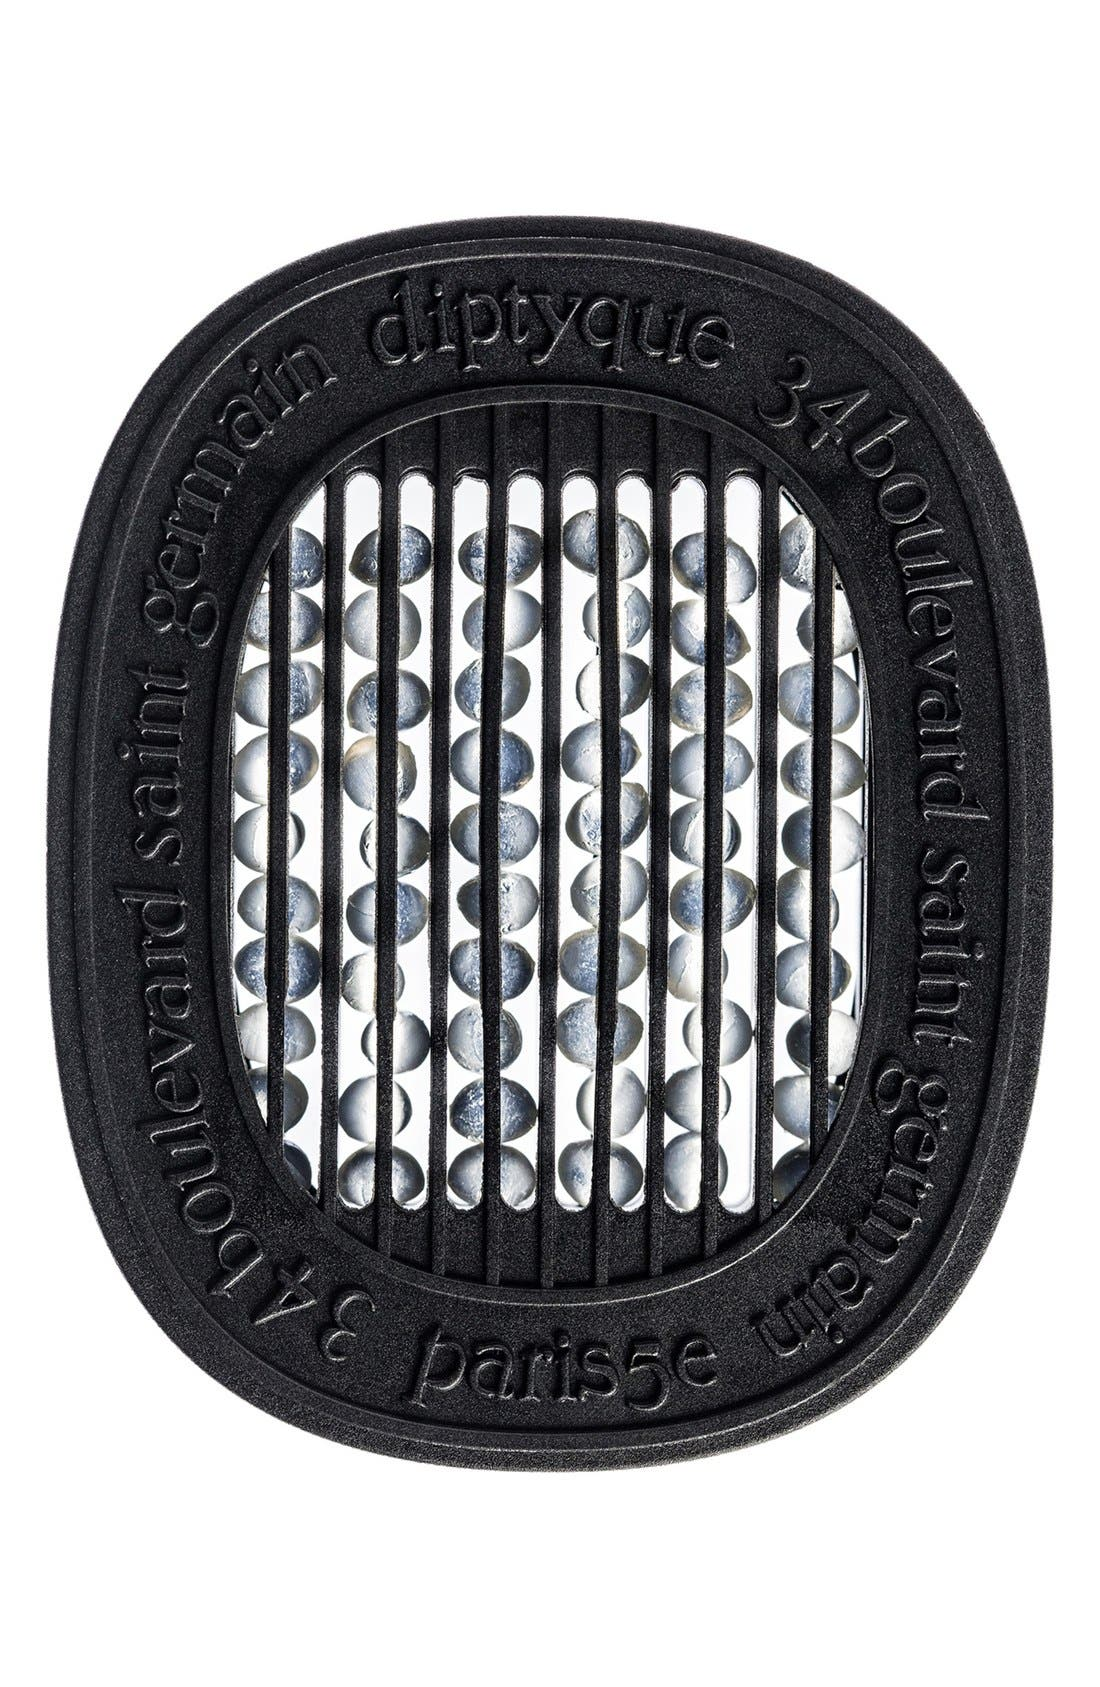 Main Image - diptyque 'Ambre' Electric Diffuser Cartridge